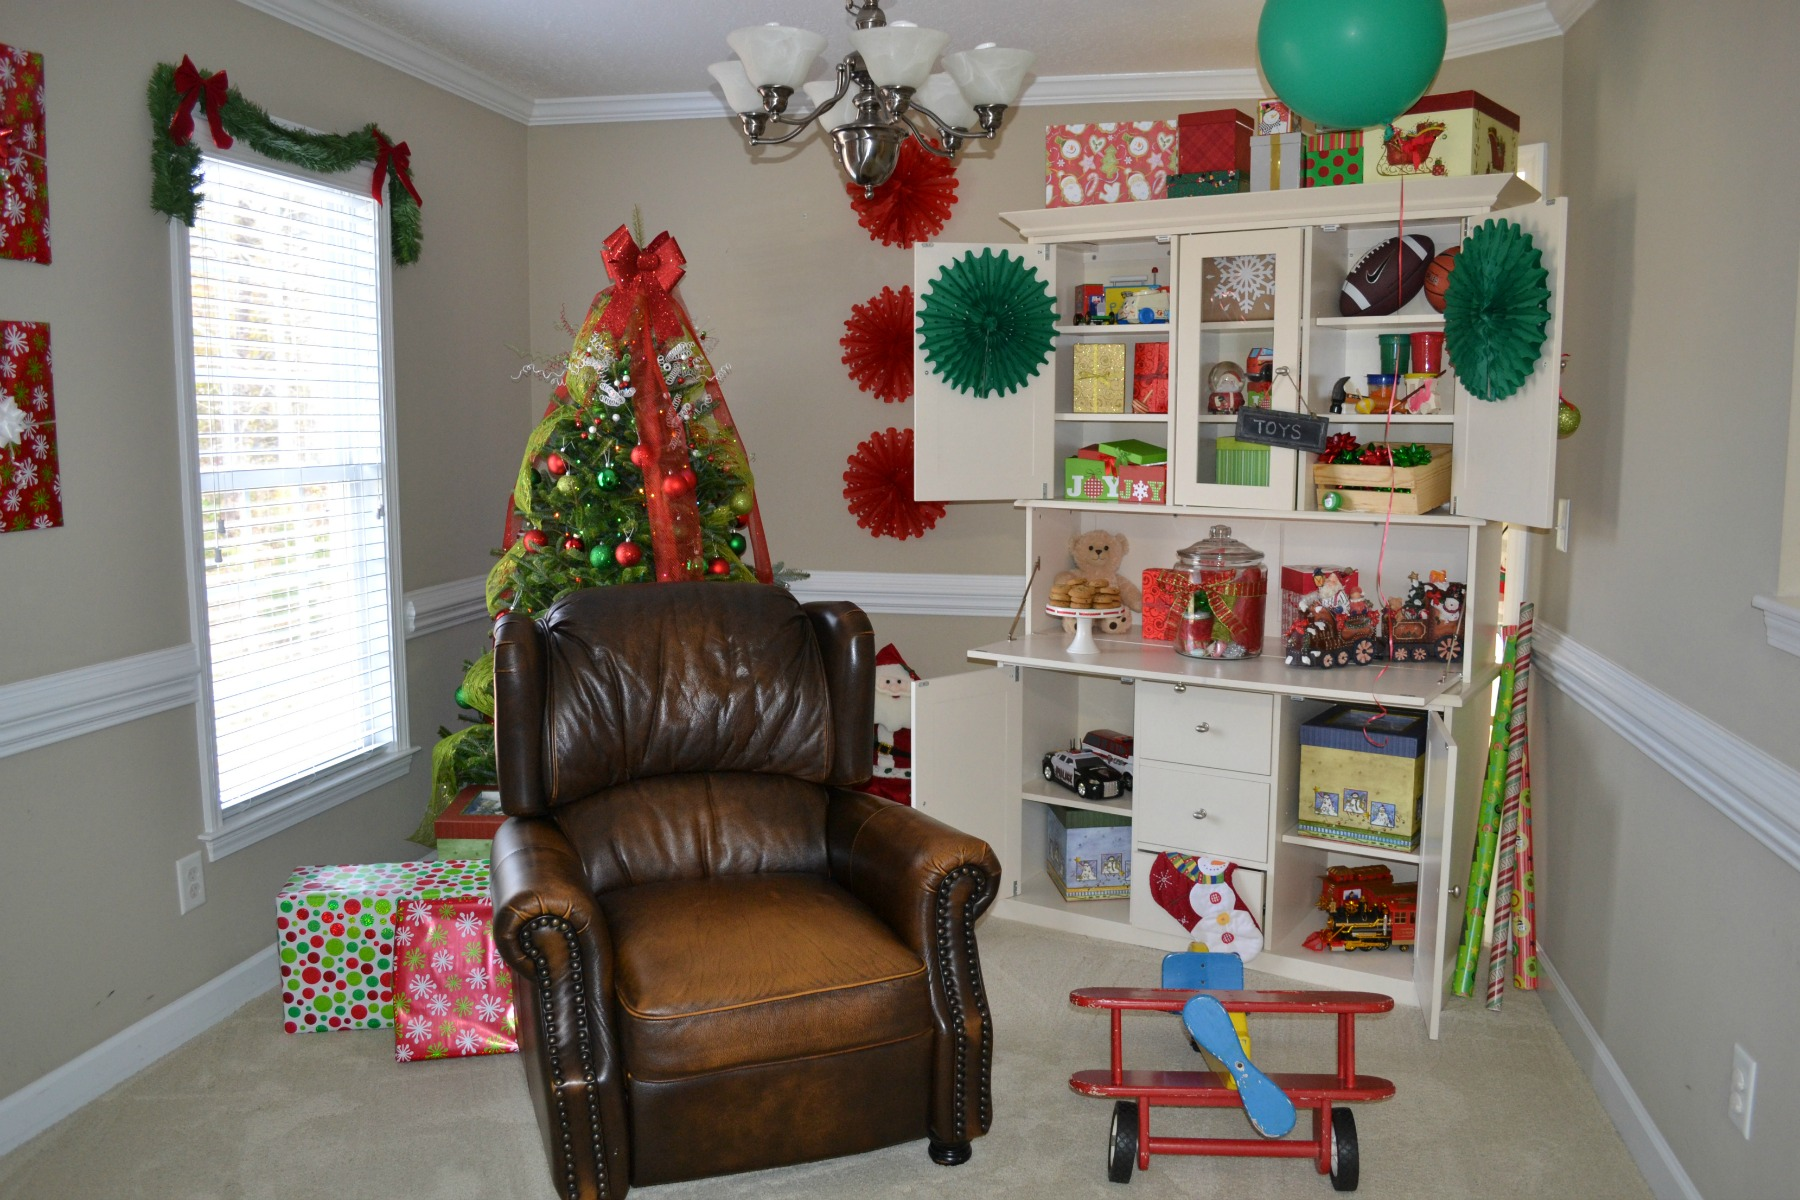 Christmas, Santa Claus, party